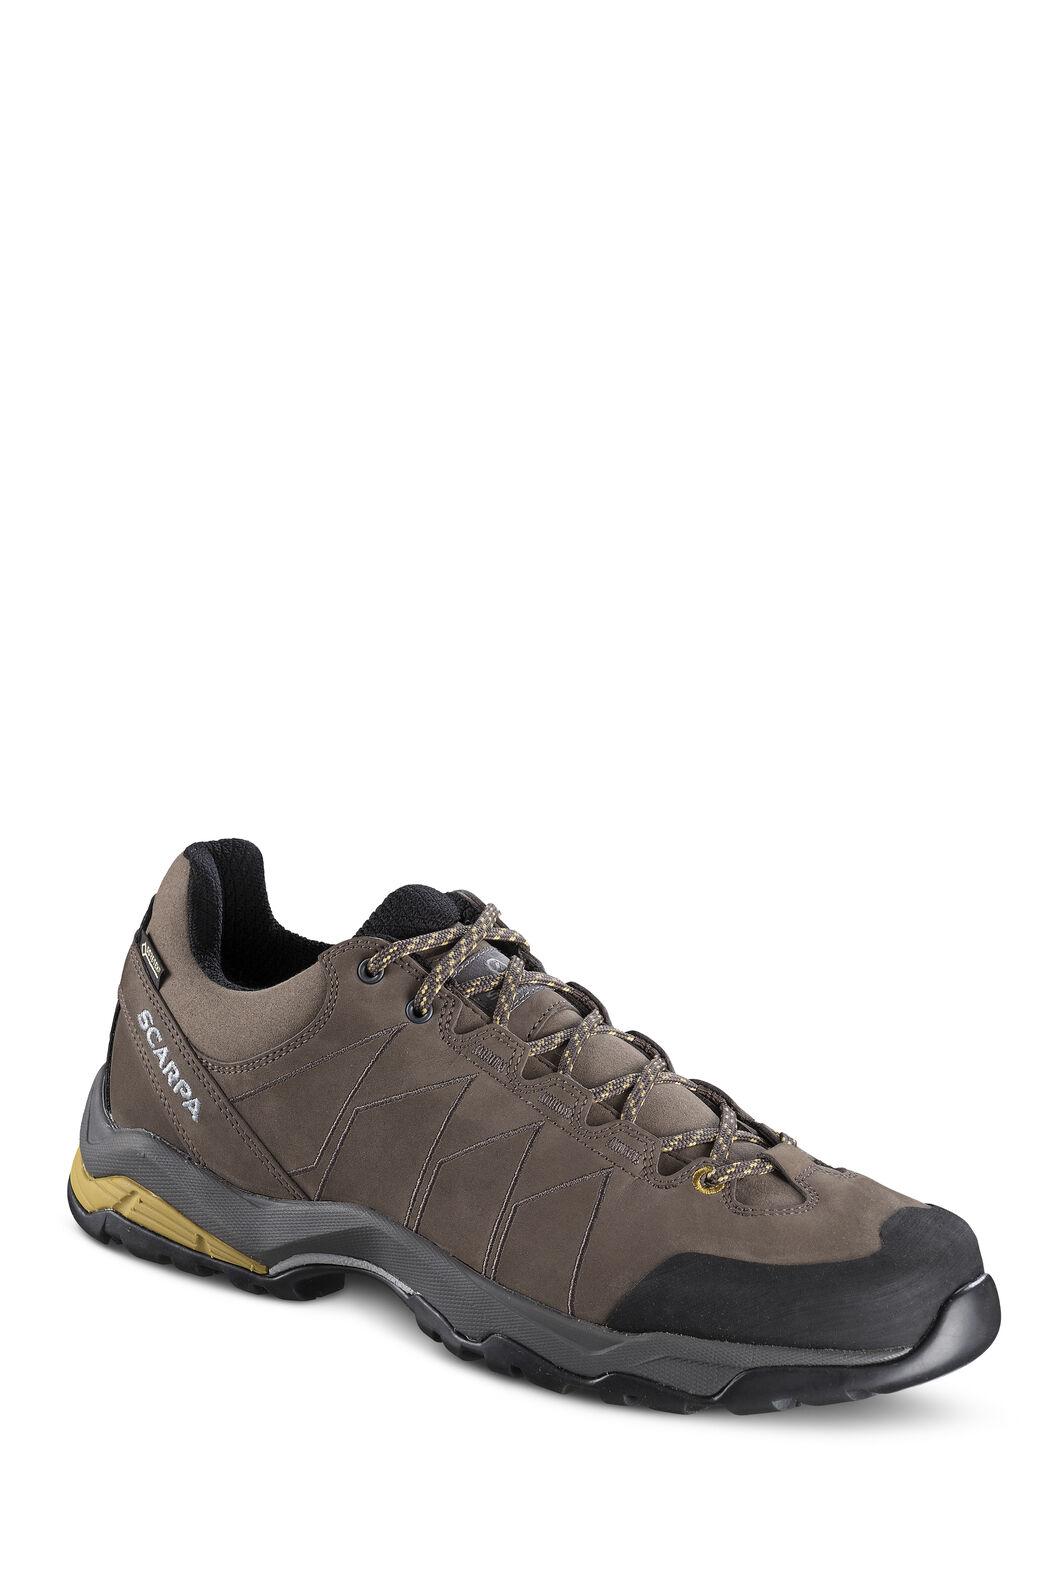 Scarpa Moraine Plus GTX Hiking Shoes - Men's, Charcoal/SulphurGreen, hi-res